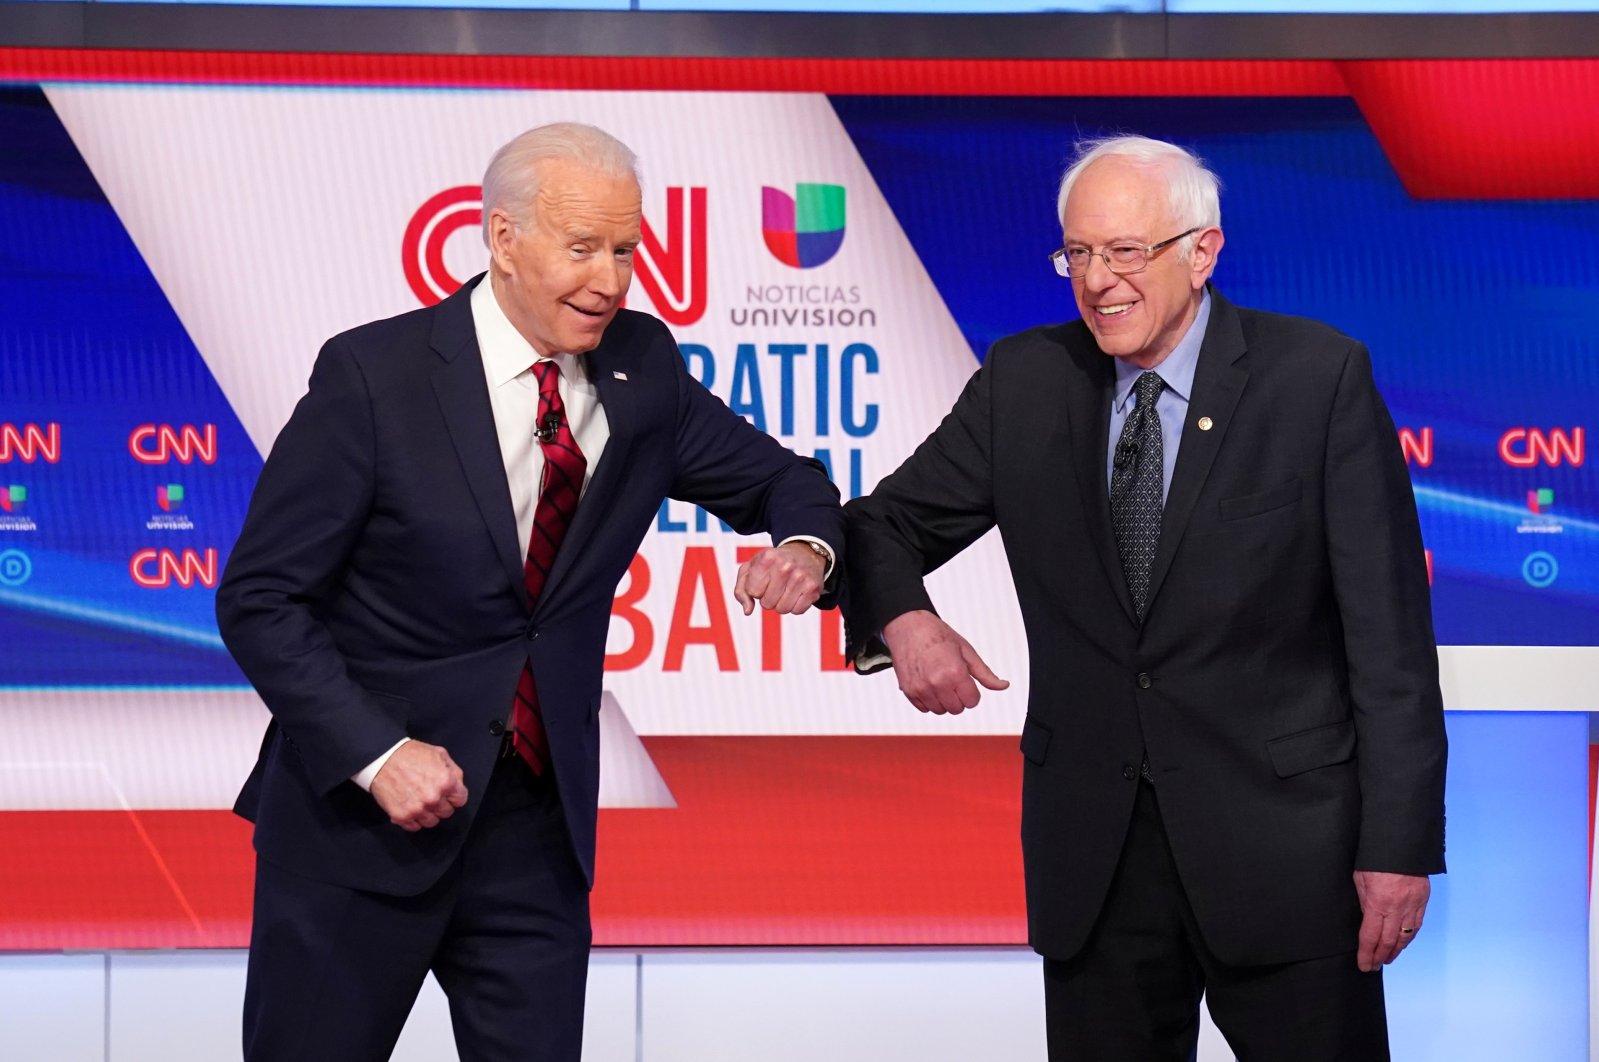 Democratic U.S. presidential candidates former Vice President Joe Biden and Senator Bernie Sanders do an elbow bump in place of a handshake, Washington, March 15, 2020. (REUTERS / Photo)